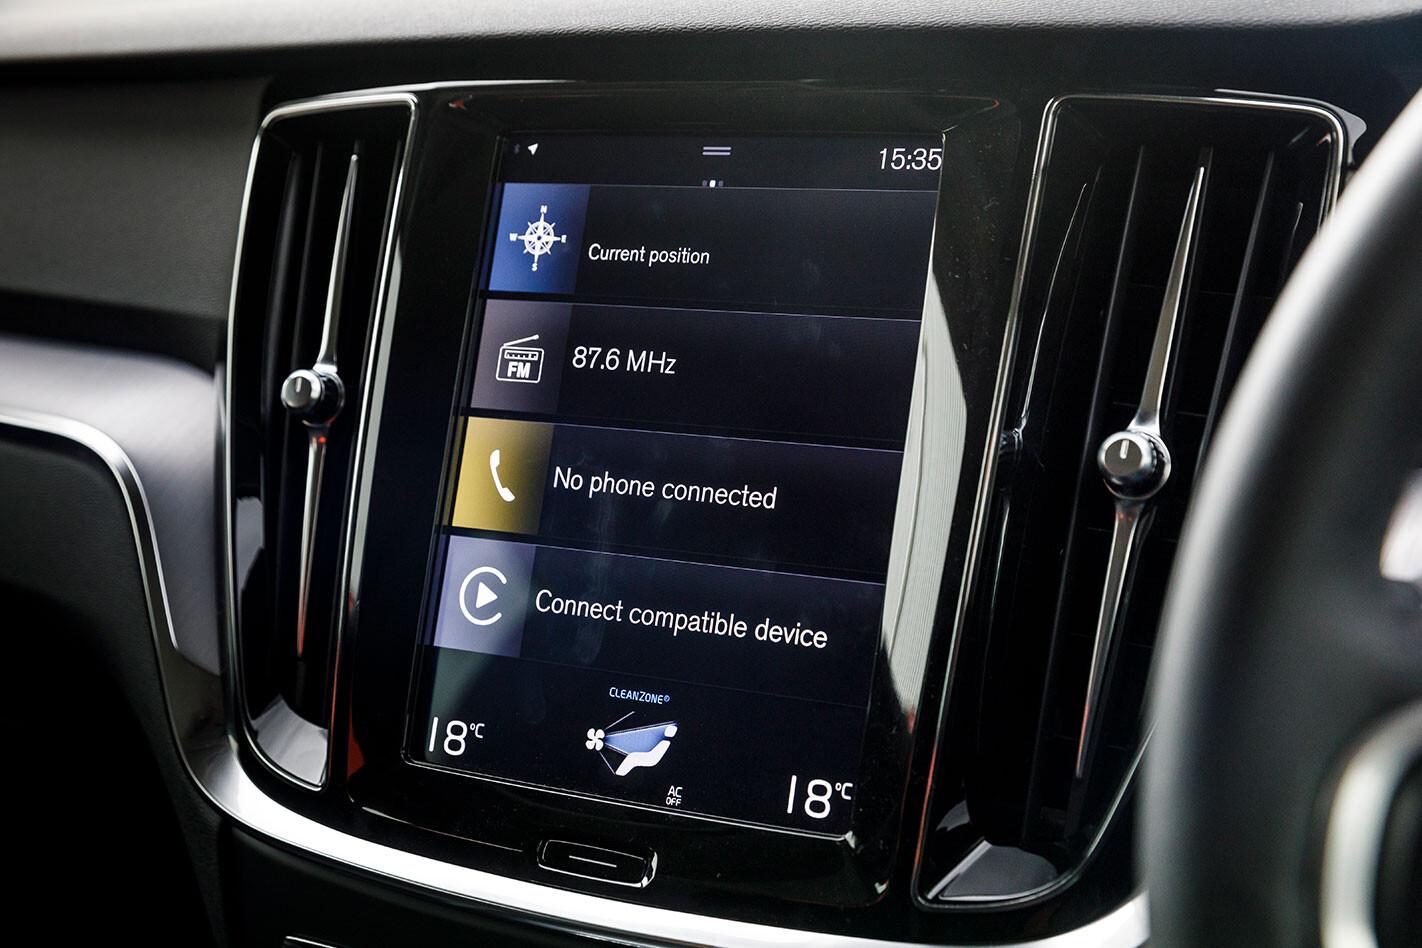 Volvo S60 T5 Momentum infotainment screen